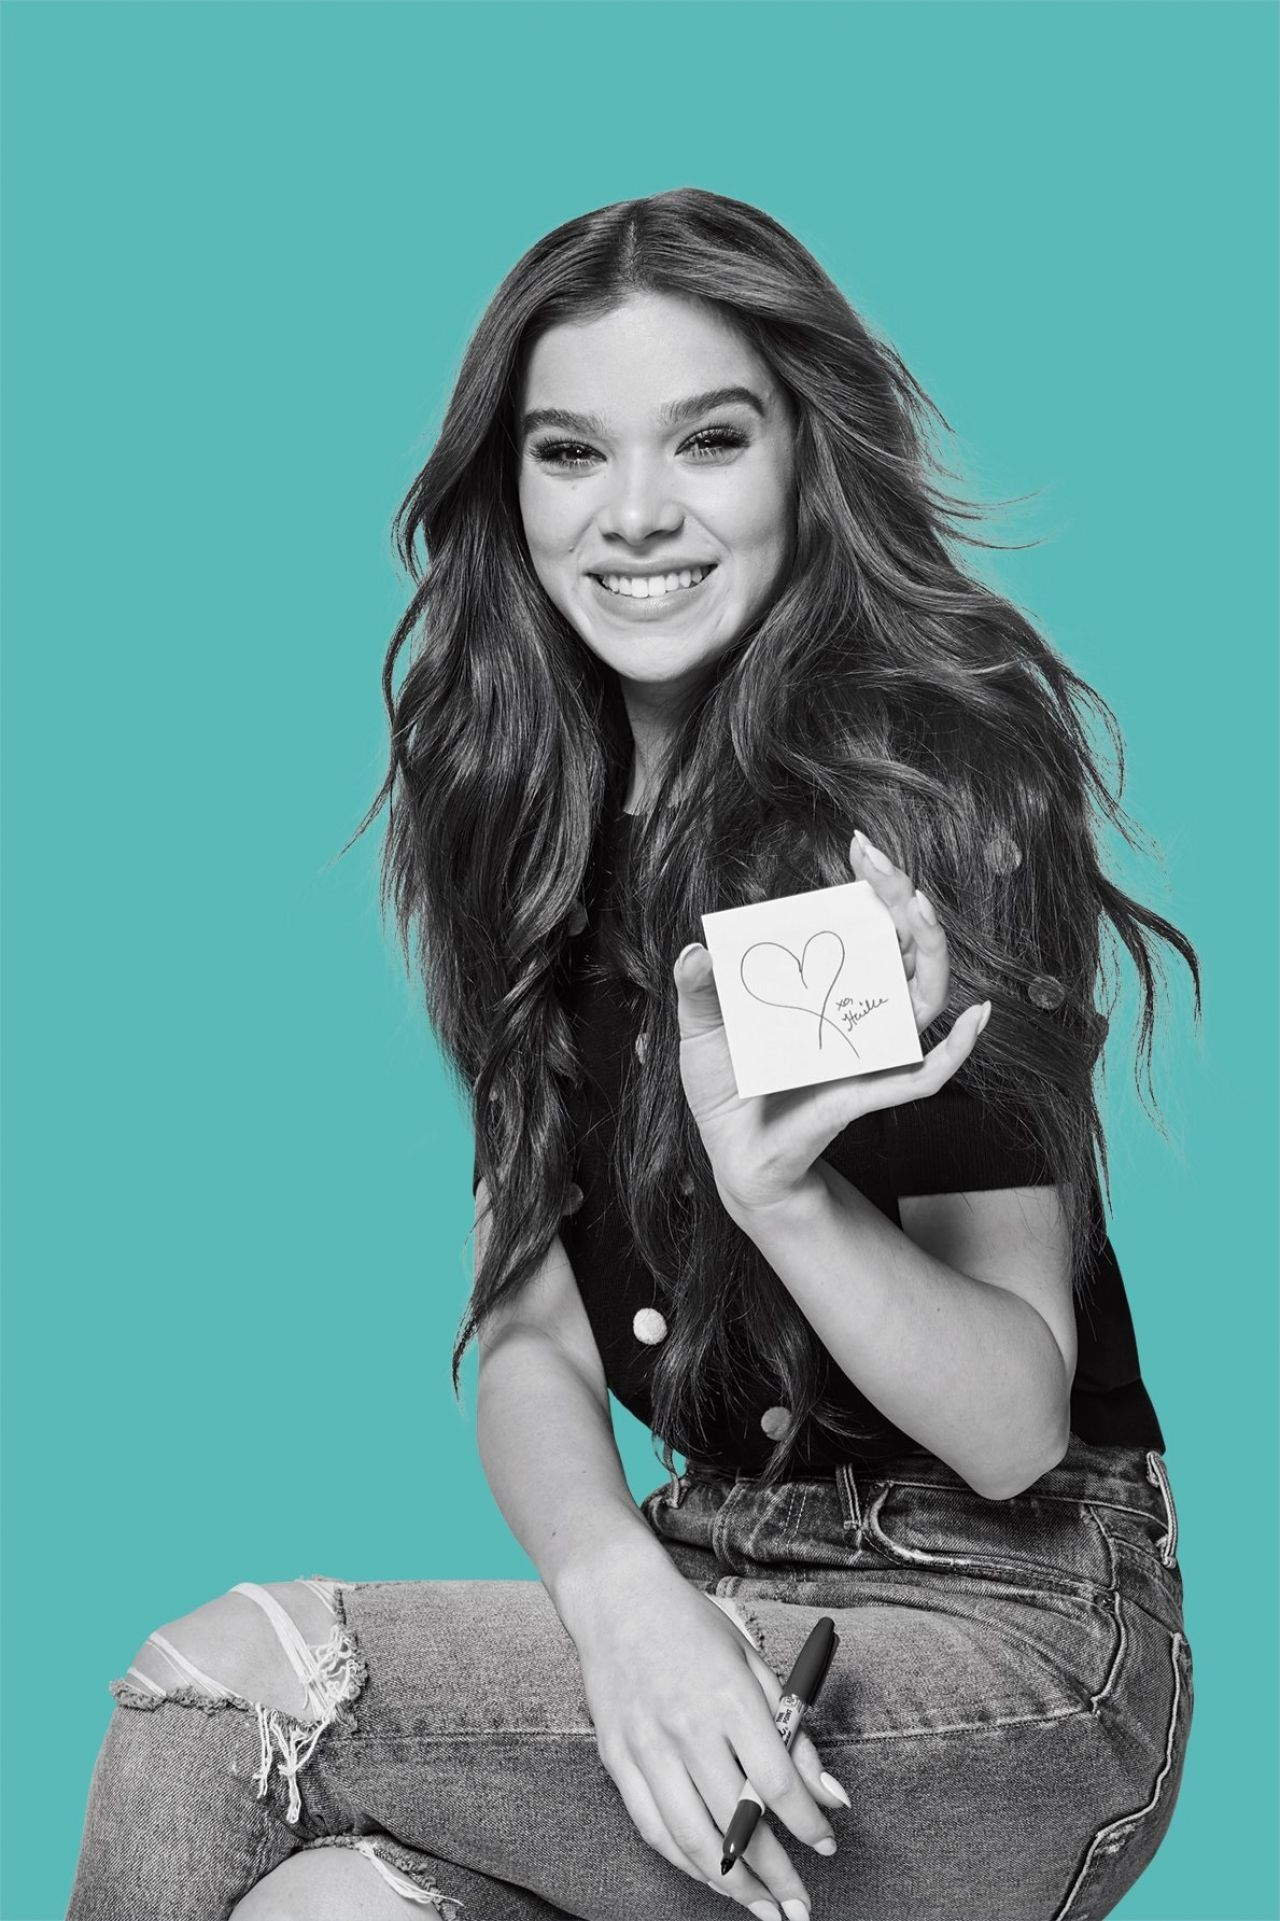 Hailee Steinfeld - Promo Photoshoot for Post-it Brand